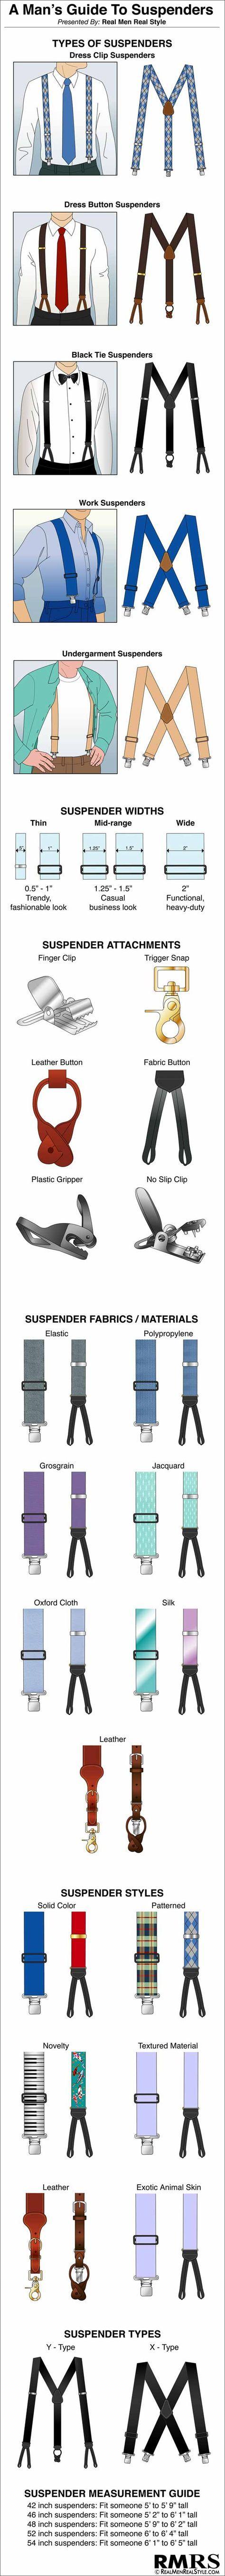 A Man's Guide To Suspenders   Trouser Braces Infographic   Suspender Guide (via @antoniocenteno)